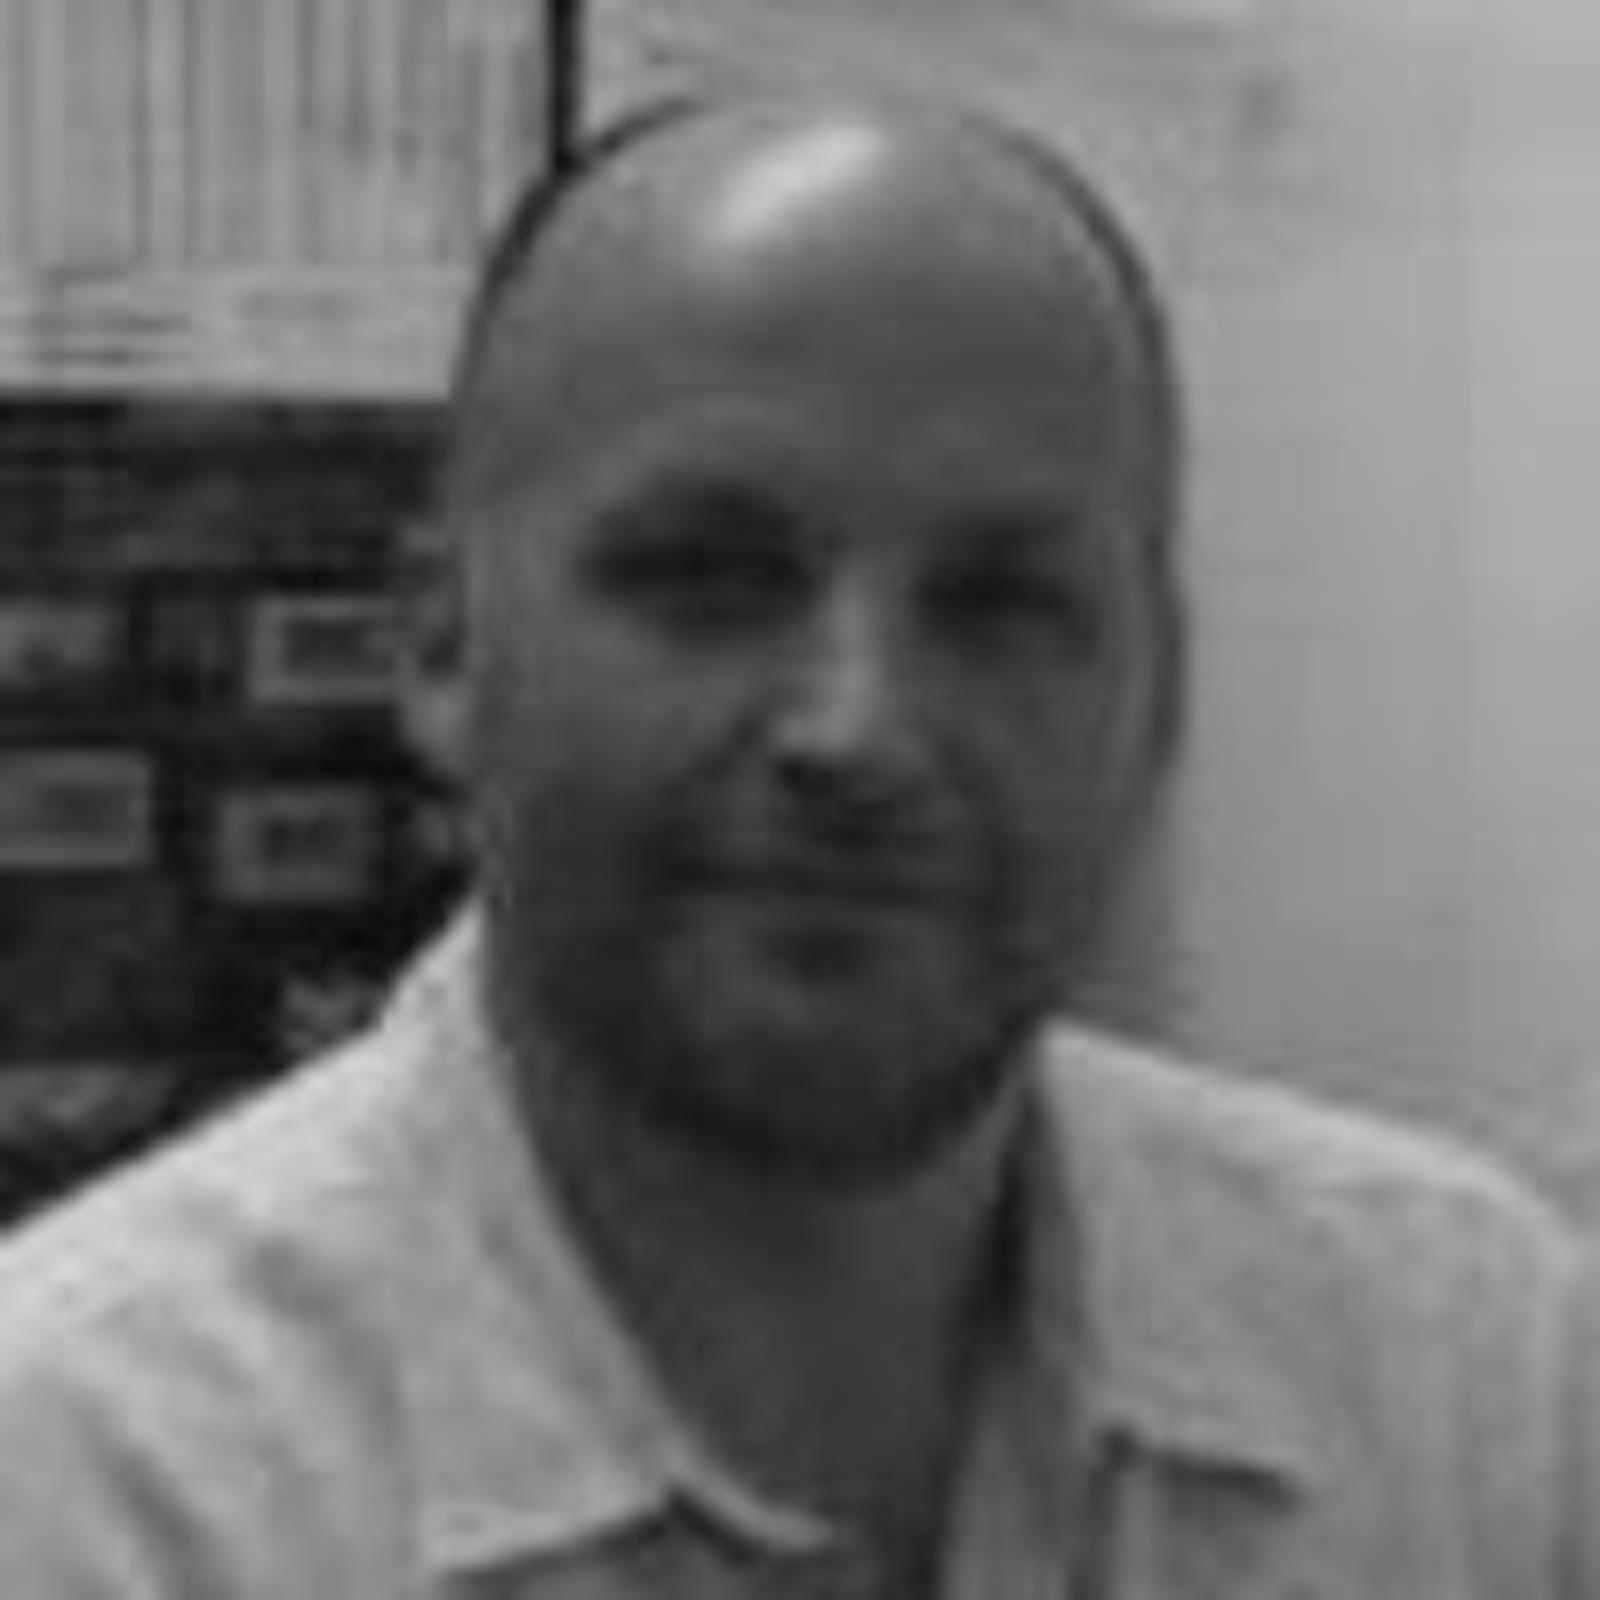 Neil Lamont